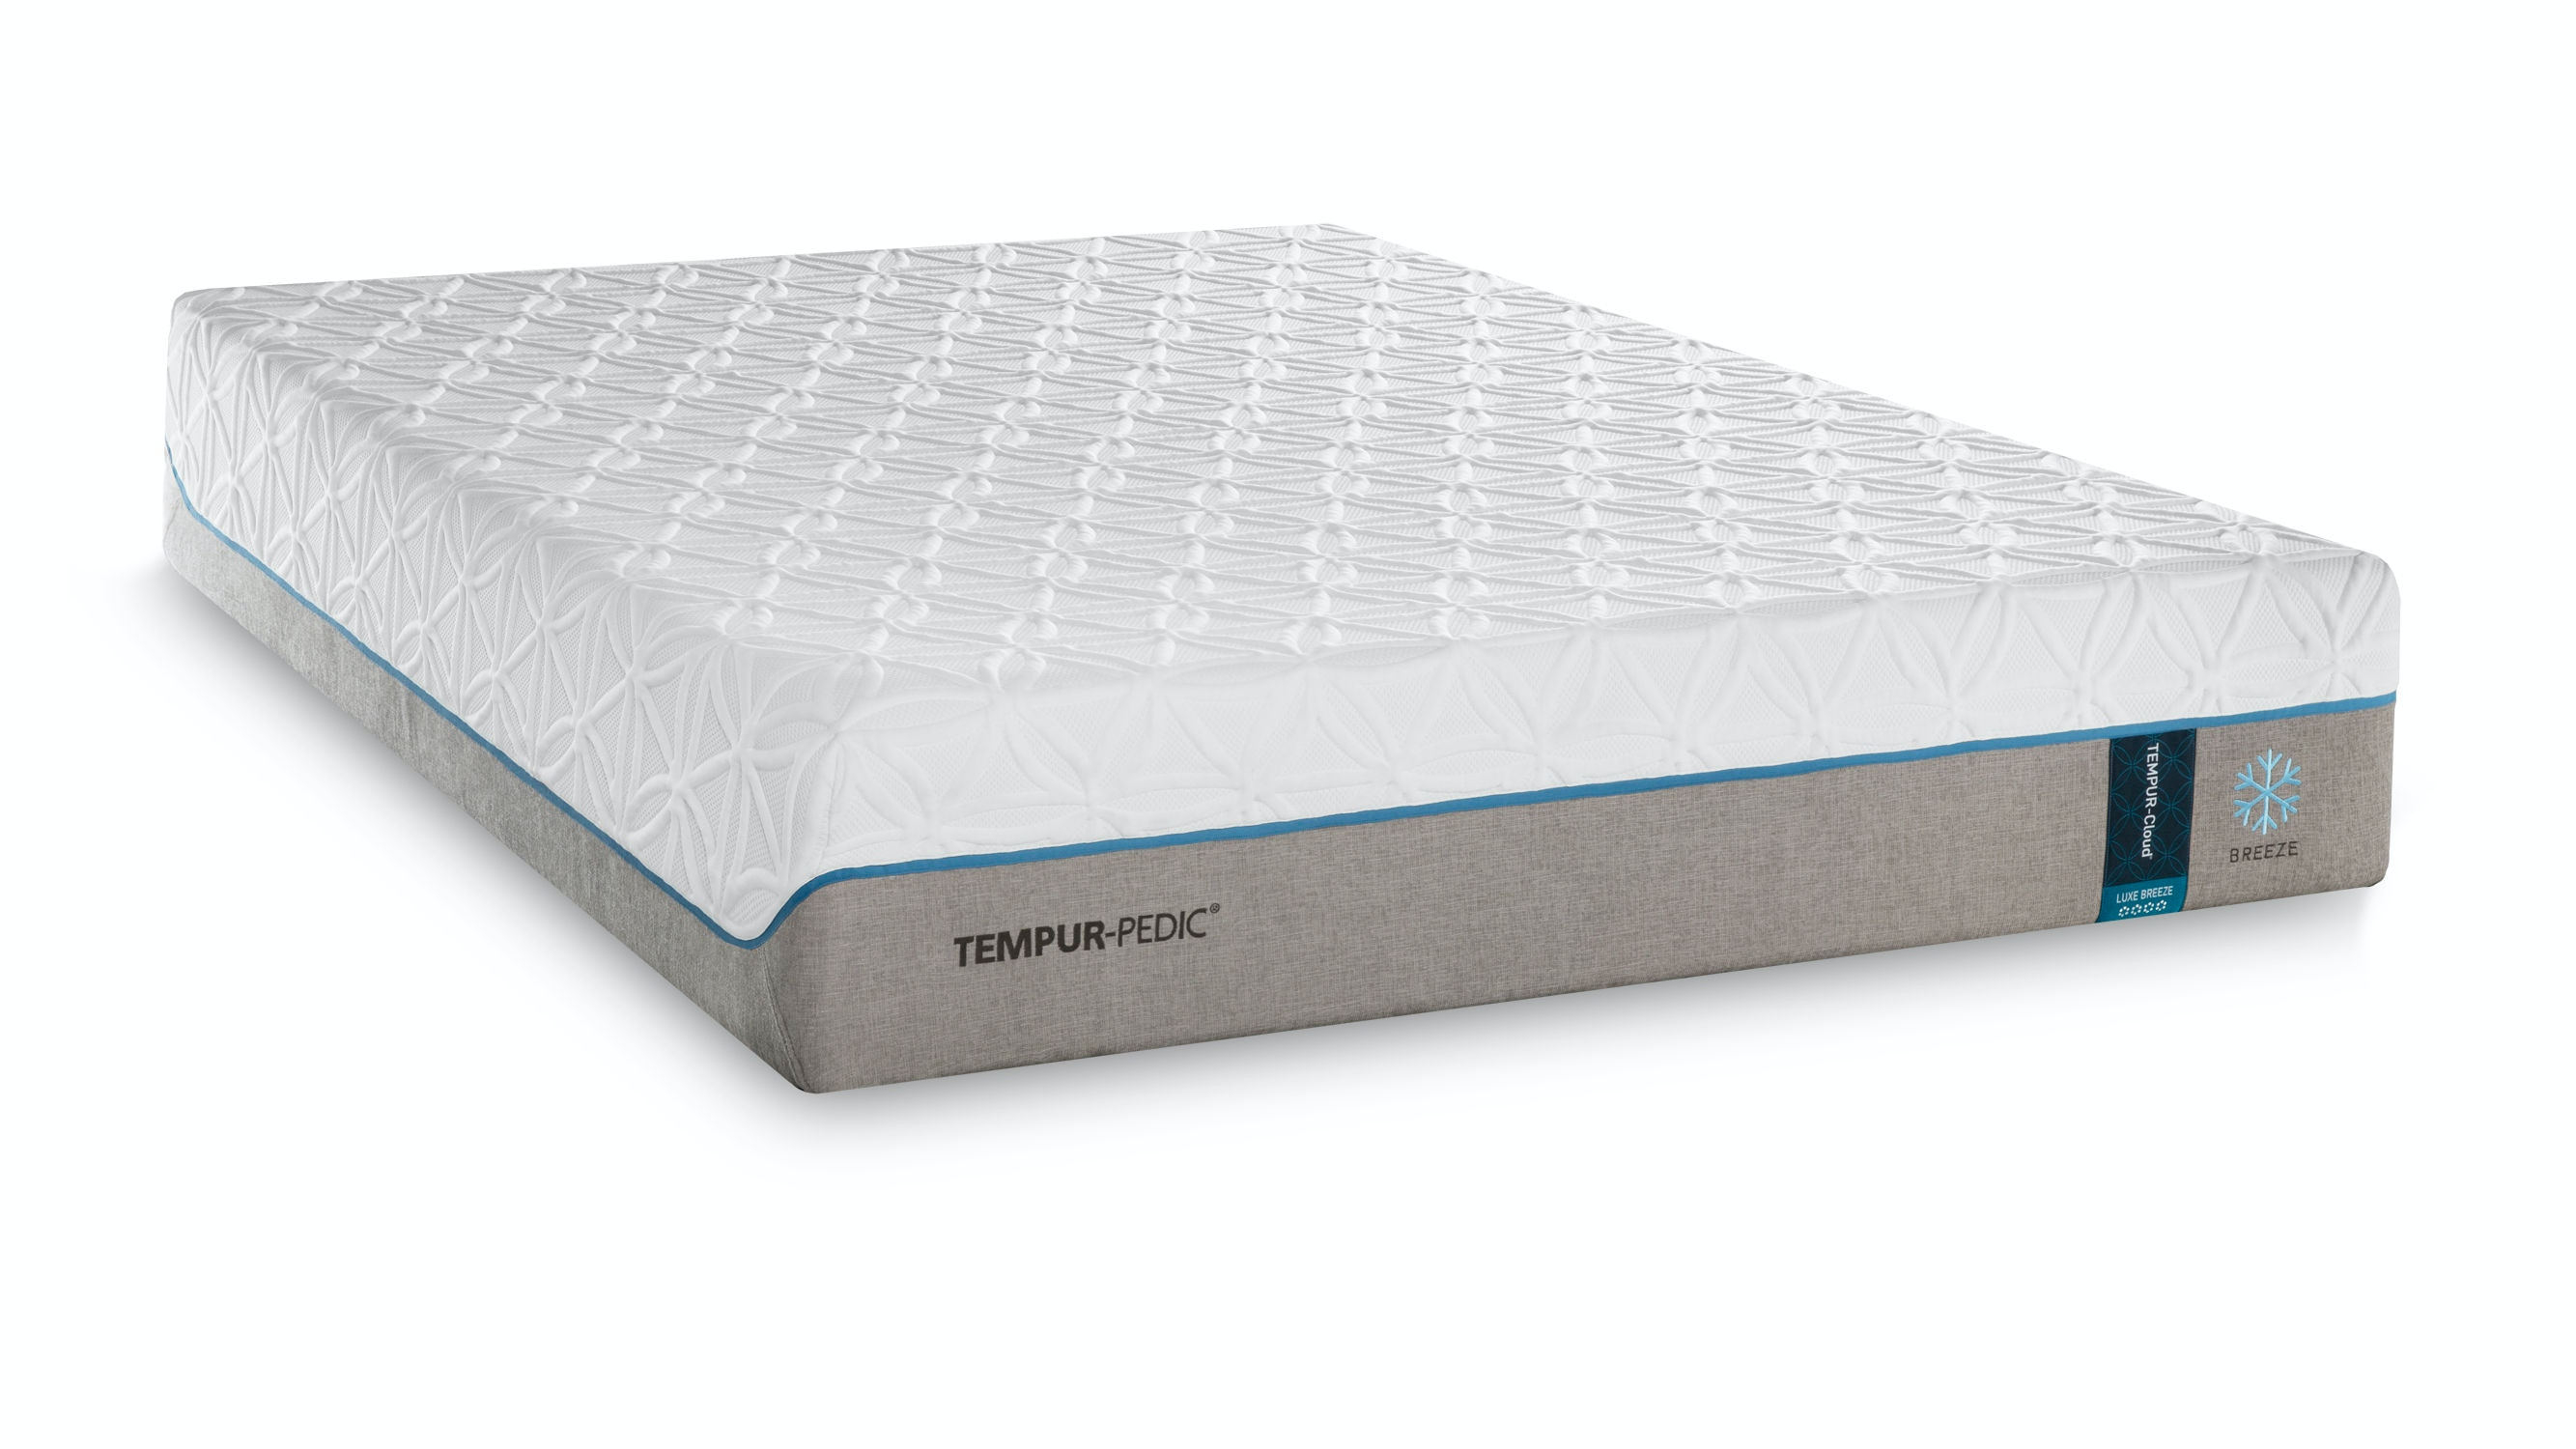 tempurcloud u2013 luxe breeze 20 u2013 mattress twin xl or calking